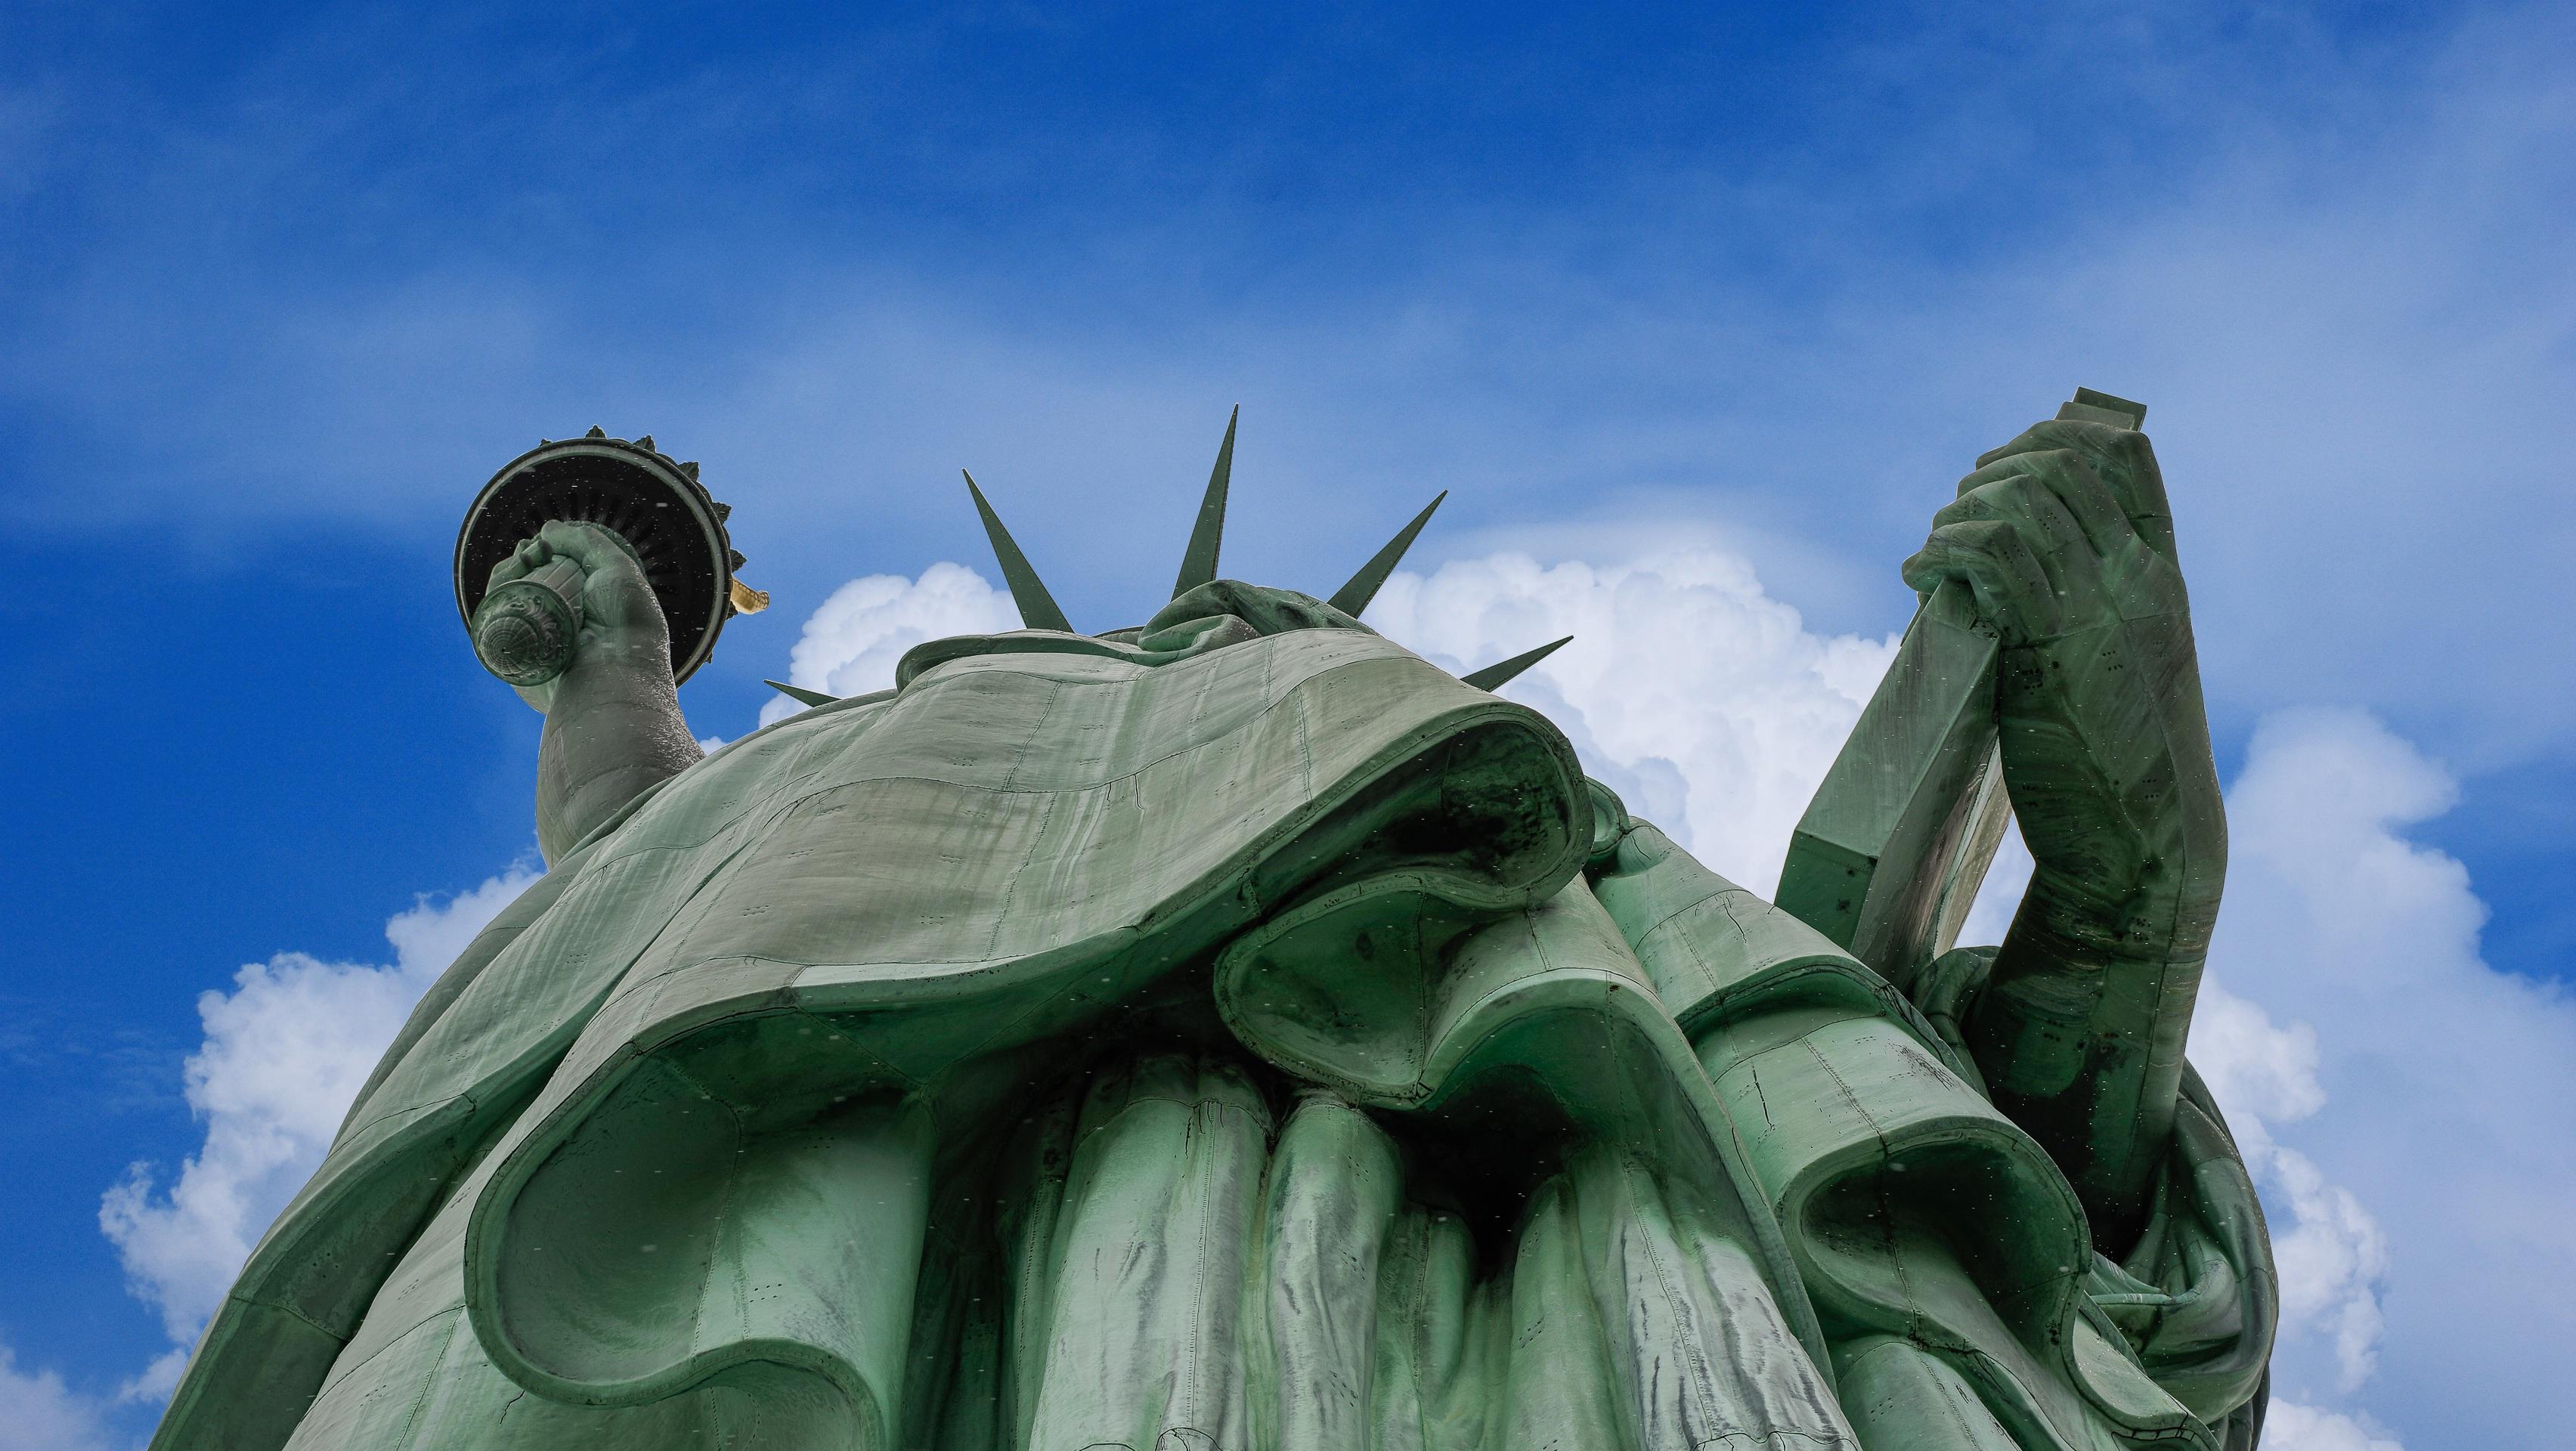 Kupfer Grüne Patina kostenlose foto rock himmel weiß monument statue tablette